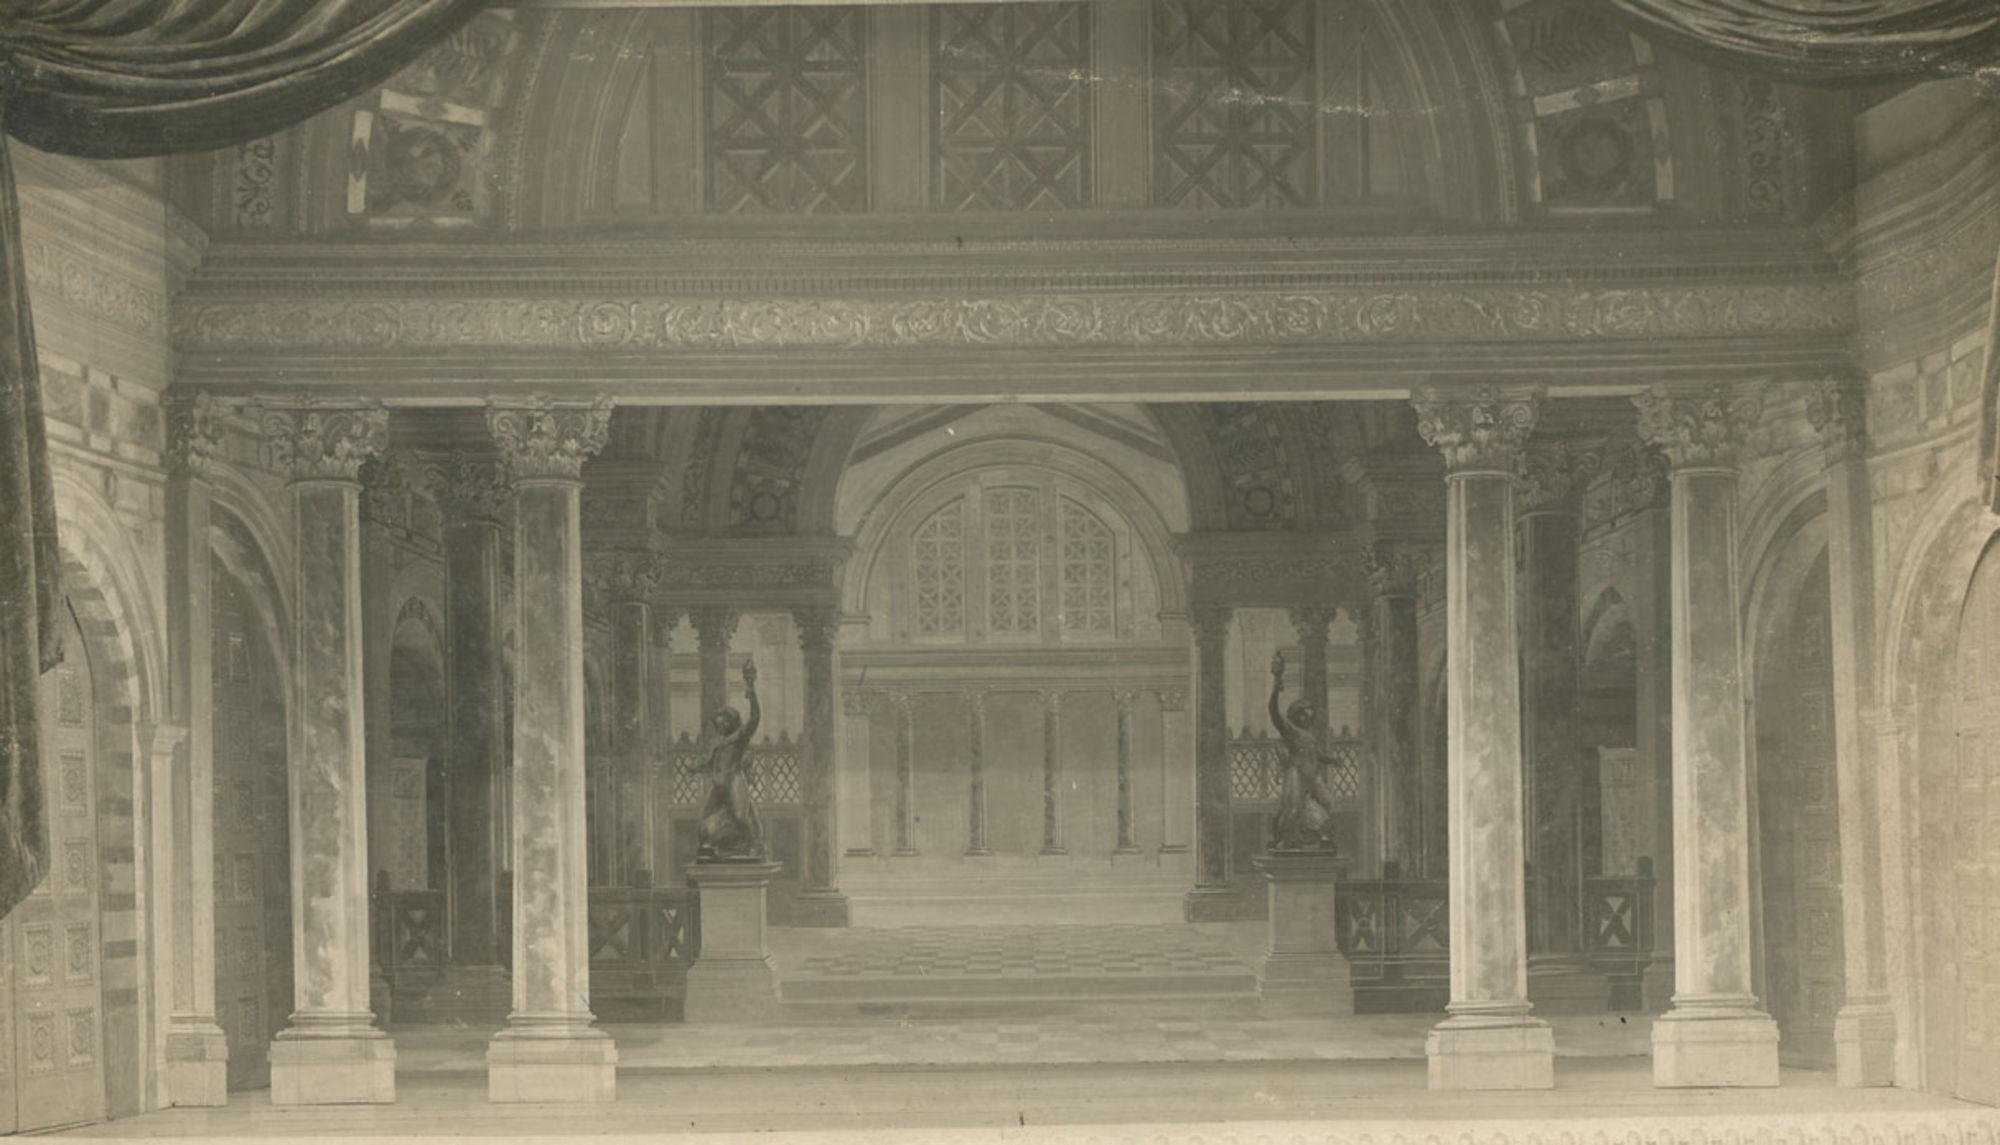 Palais romain